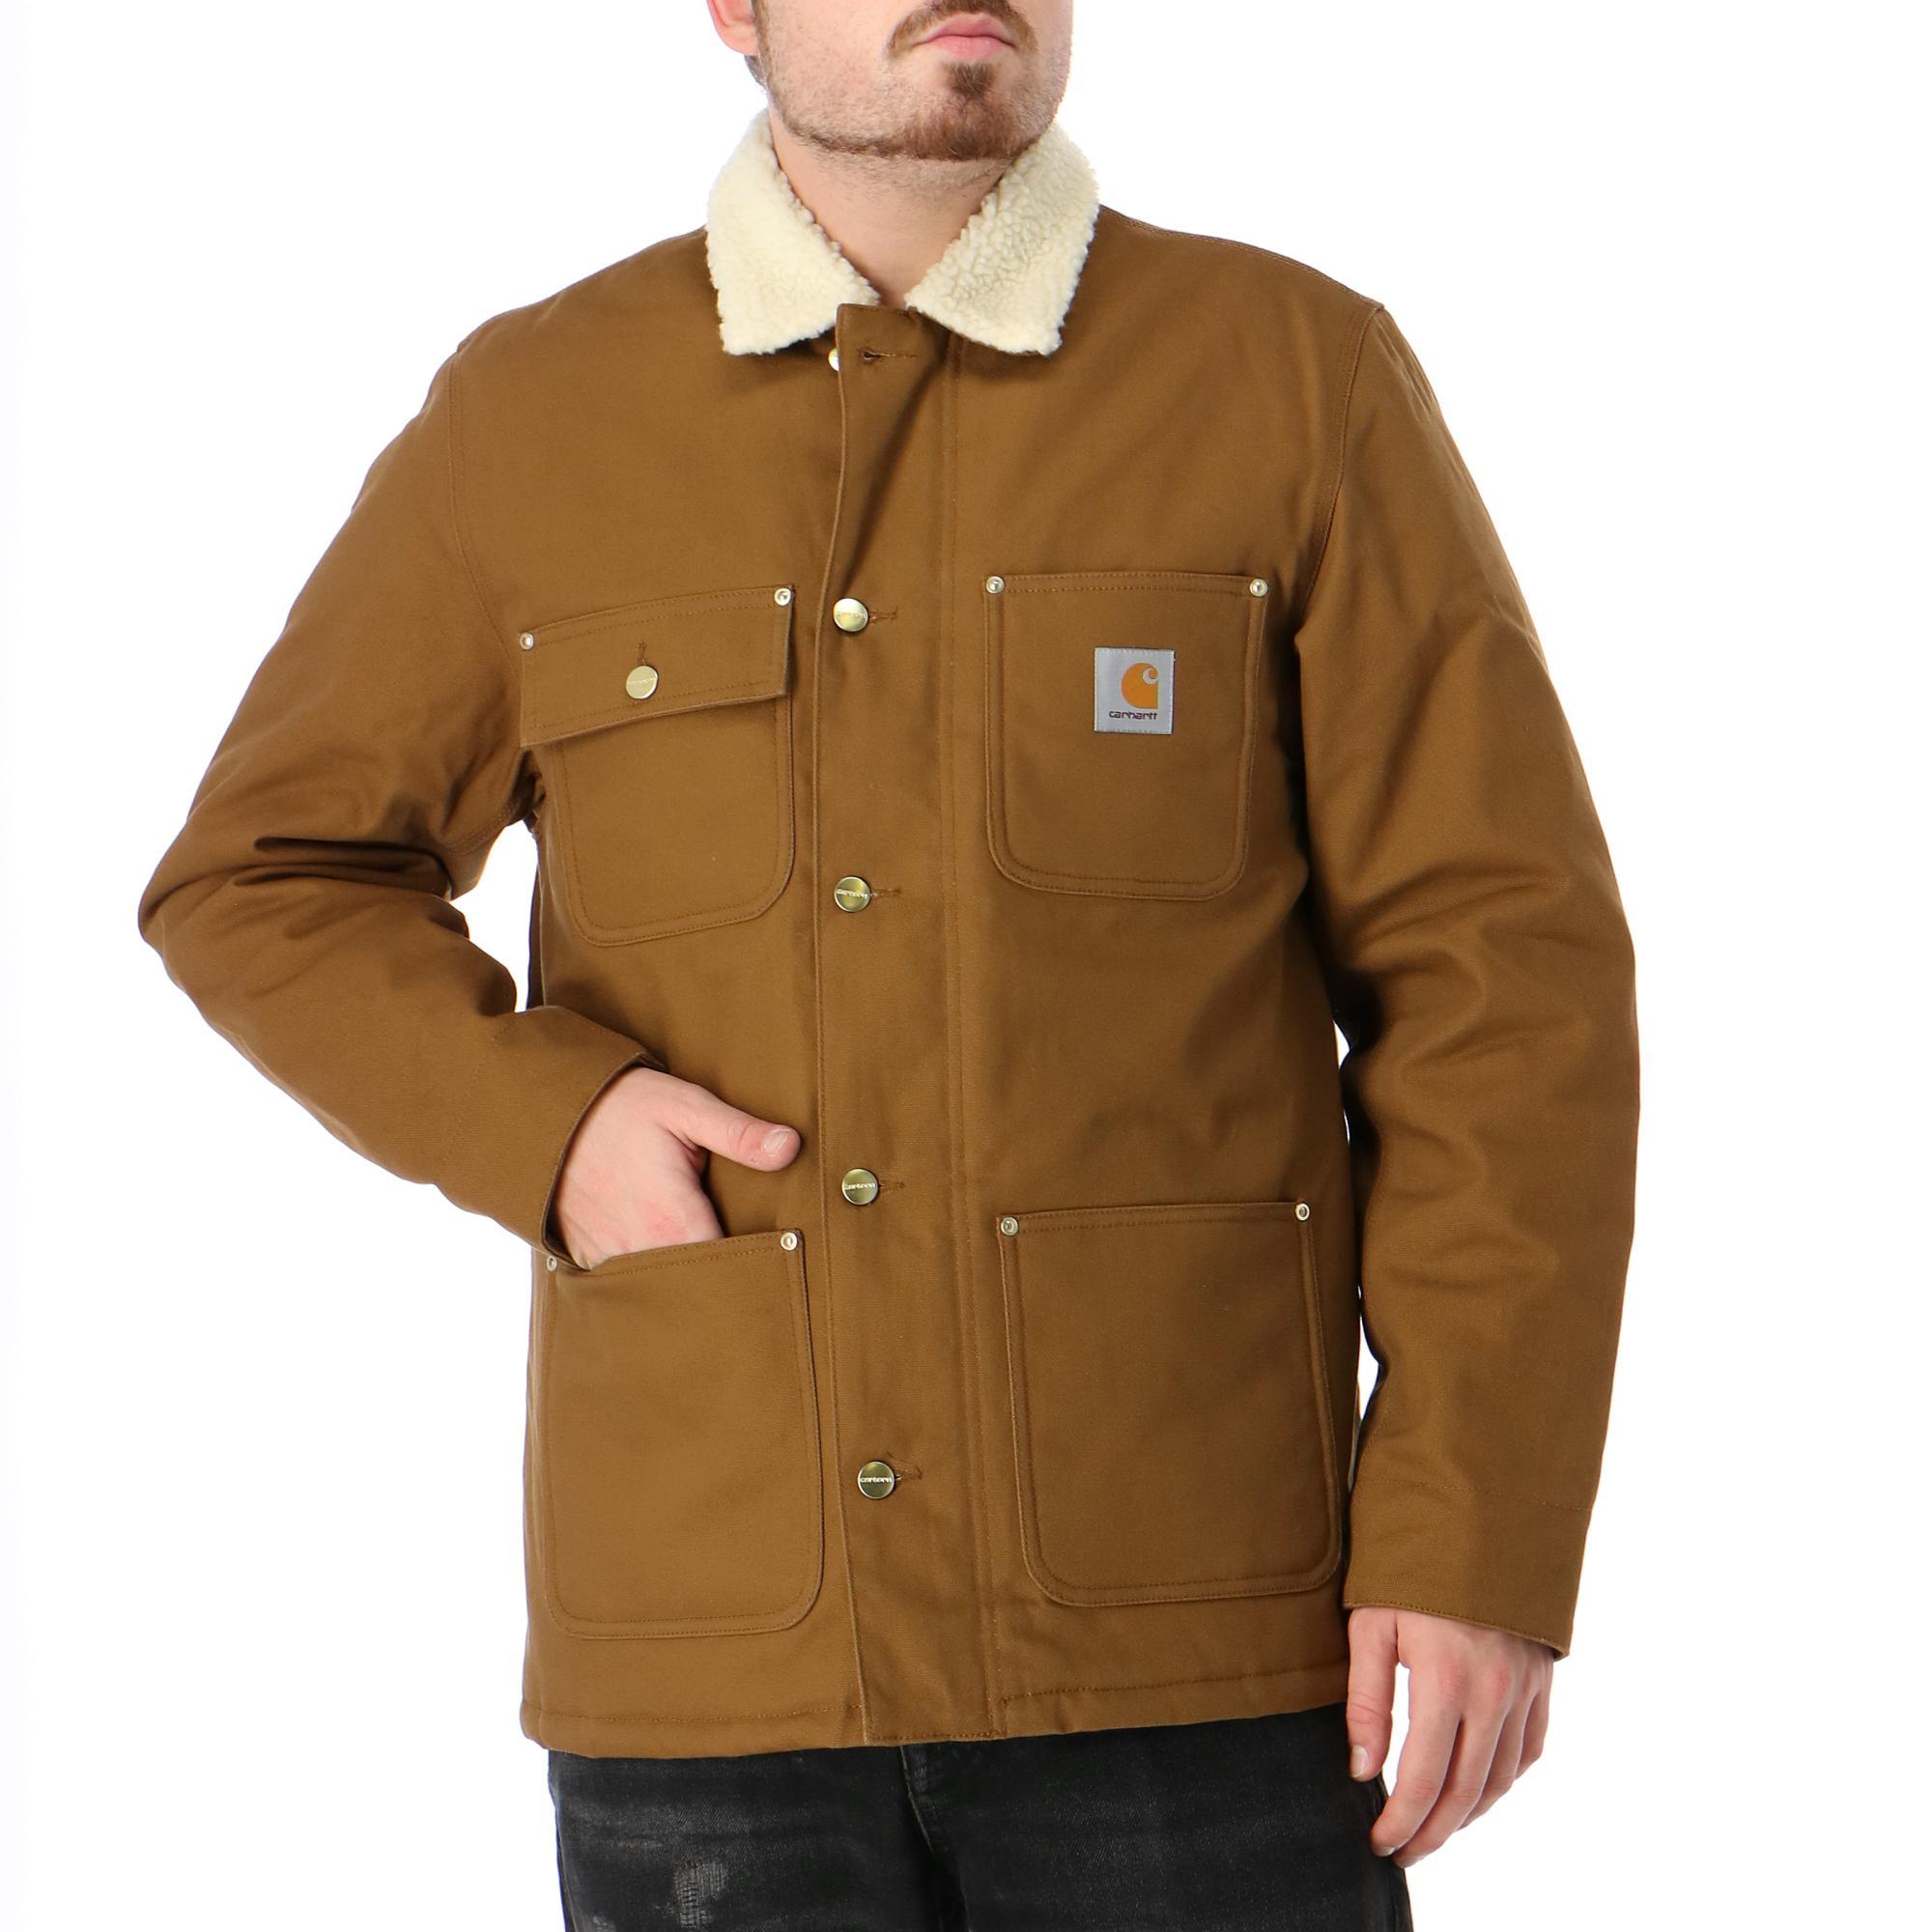 Carhartt Fairmount Coat Hamilton brown rigid